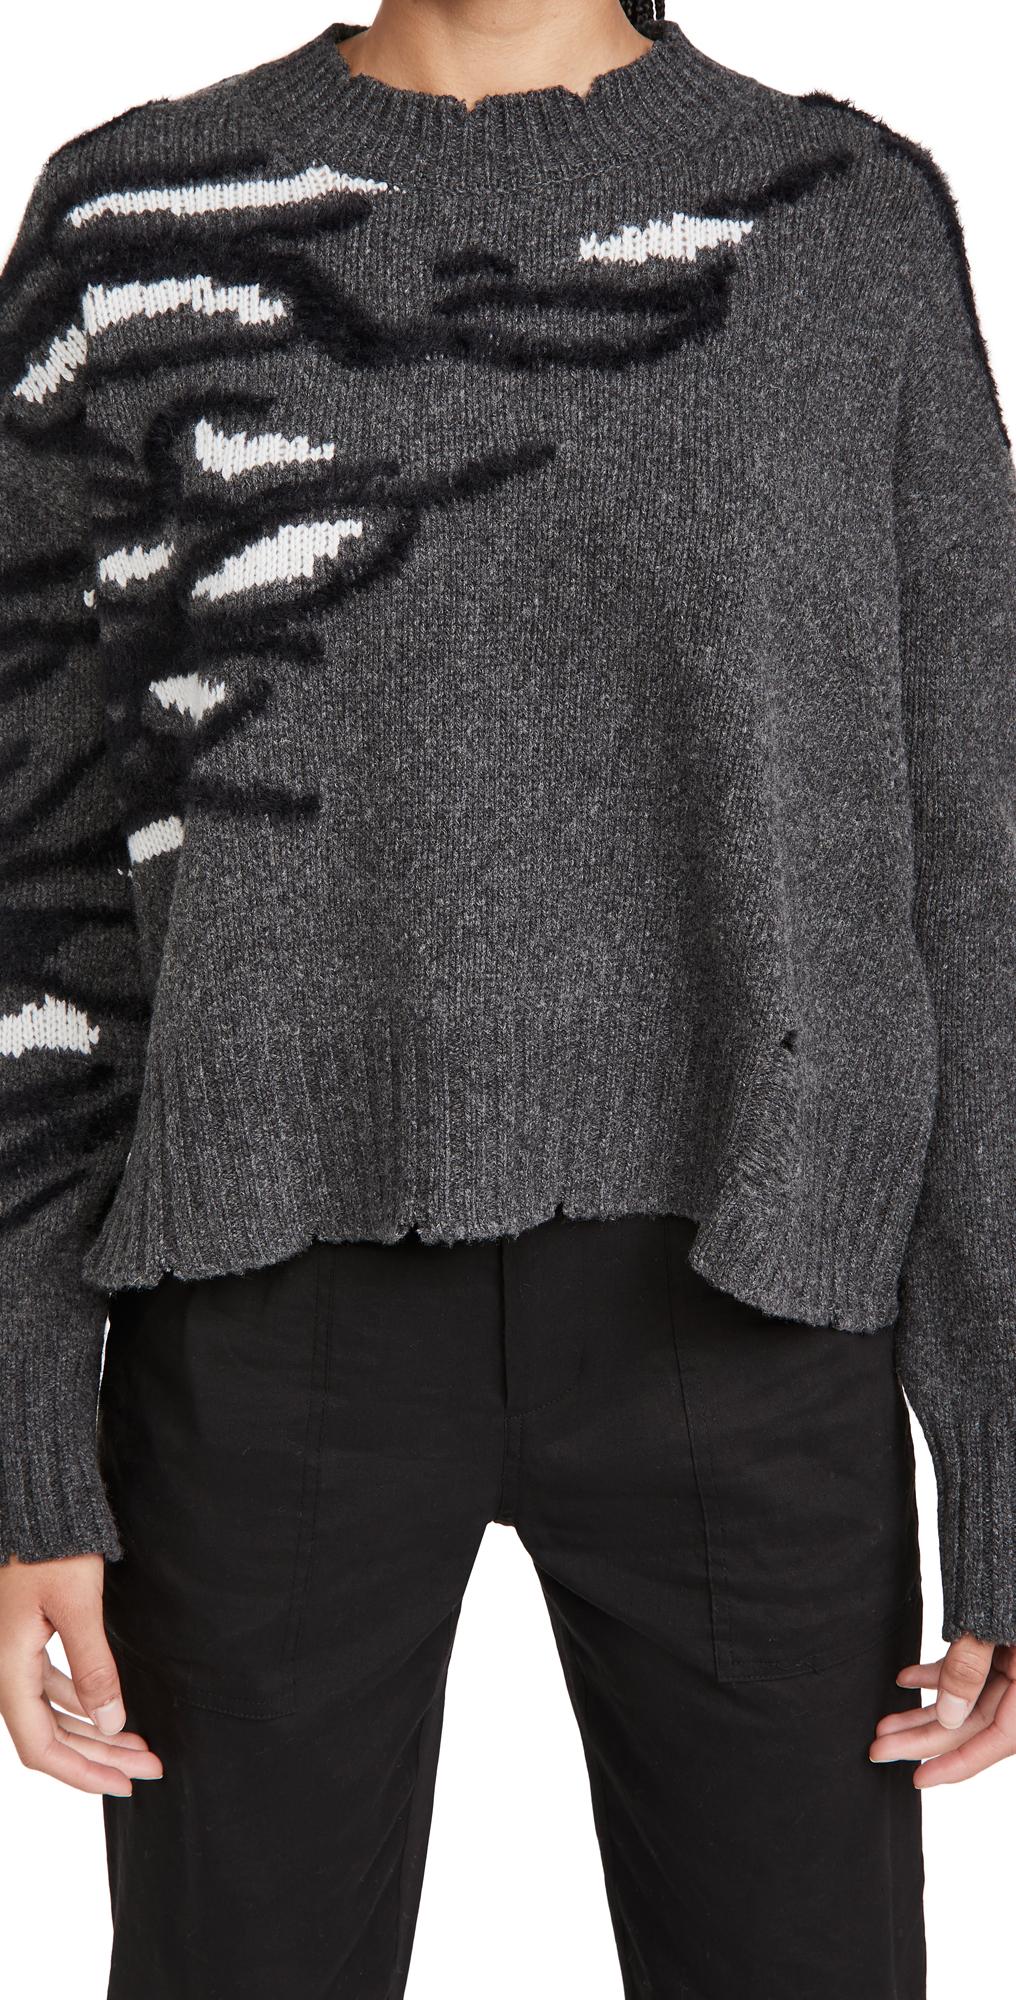 Zadig & Voltaire Starry Sweater